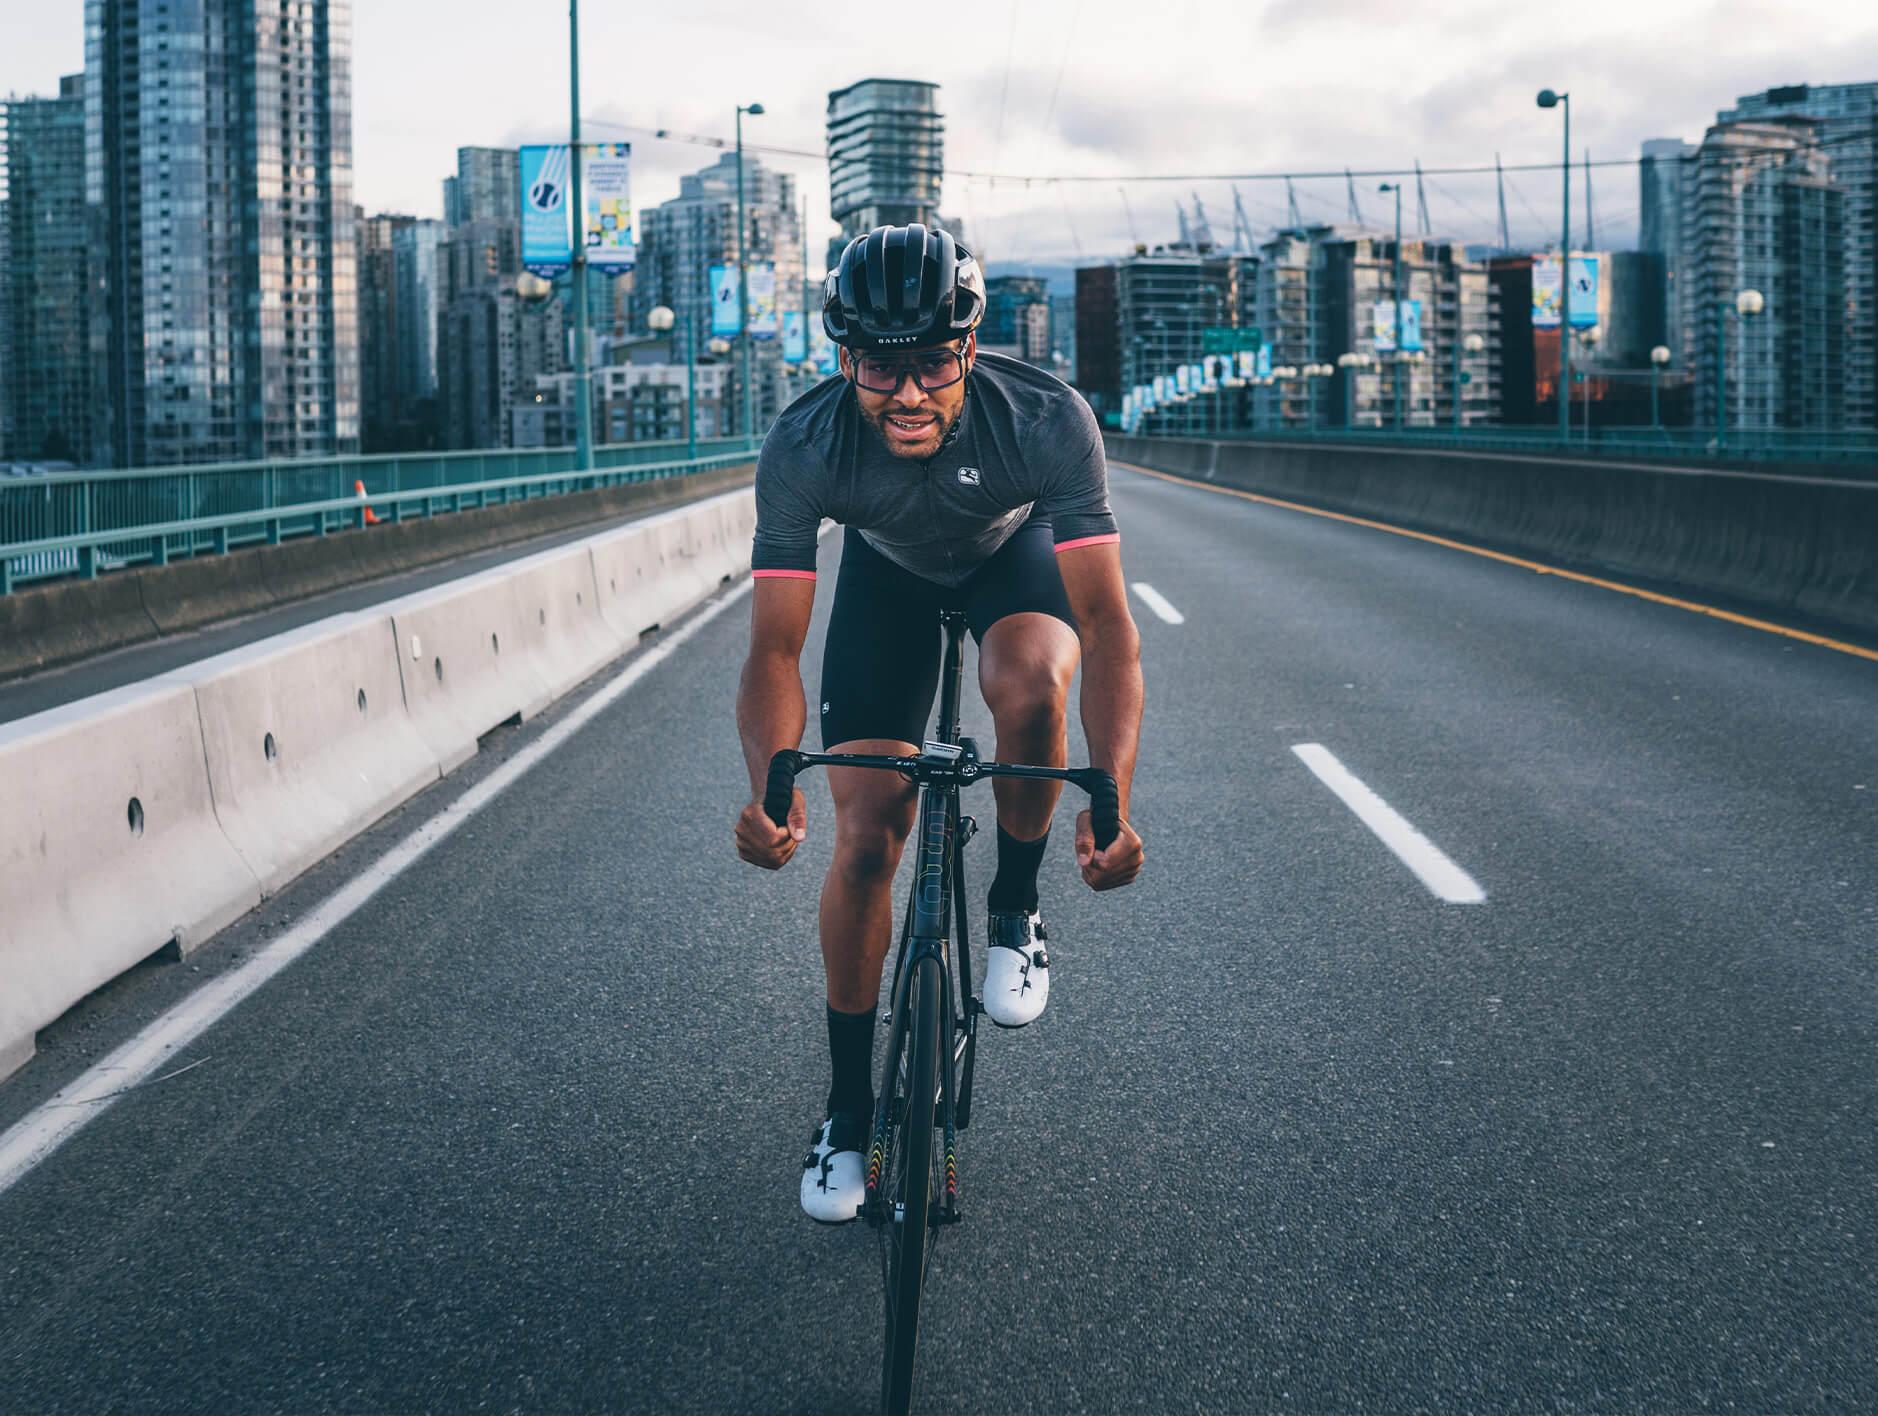 giordana-cycling-bib-short-guide-lungo-square-2